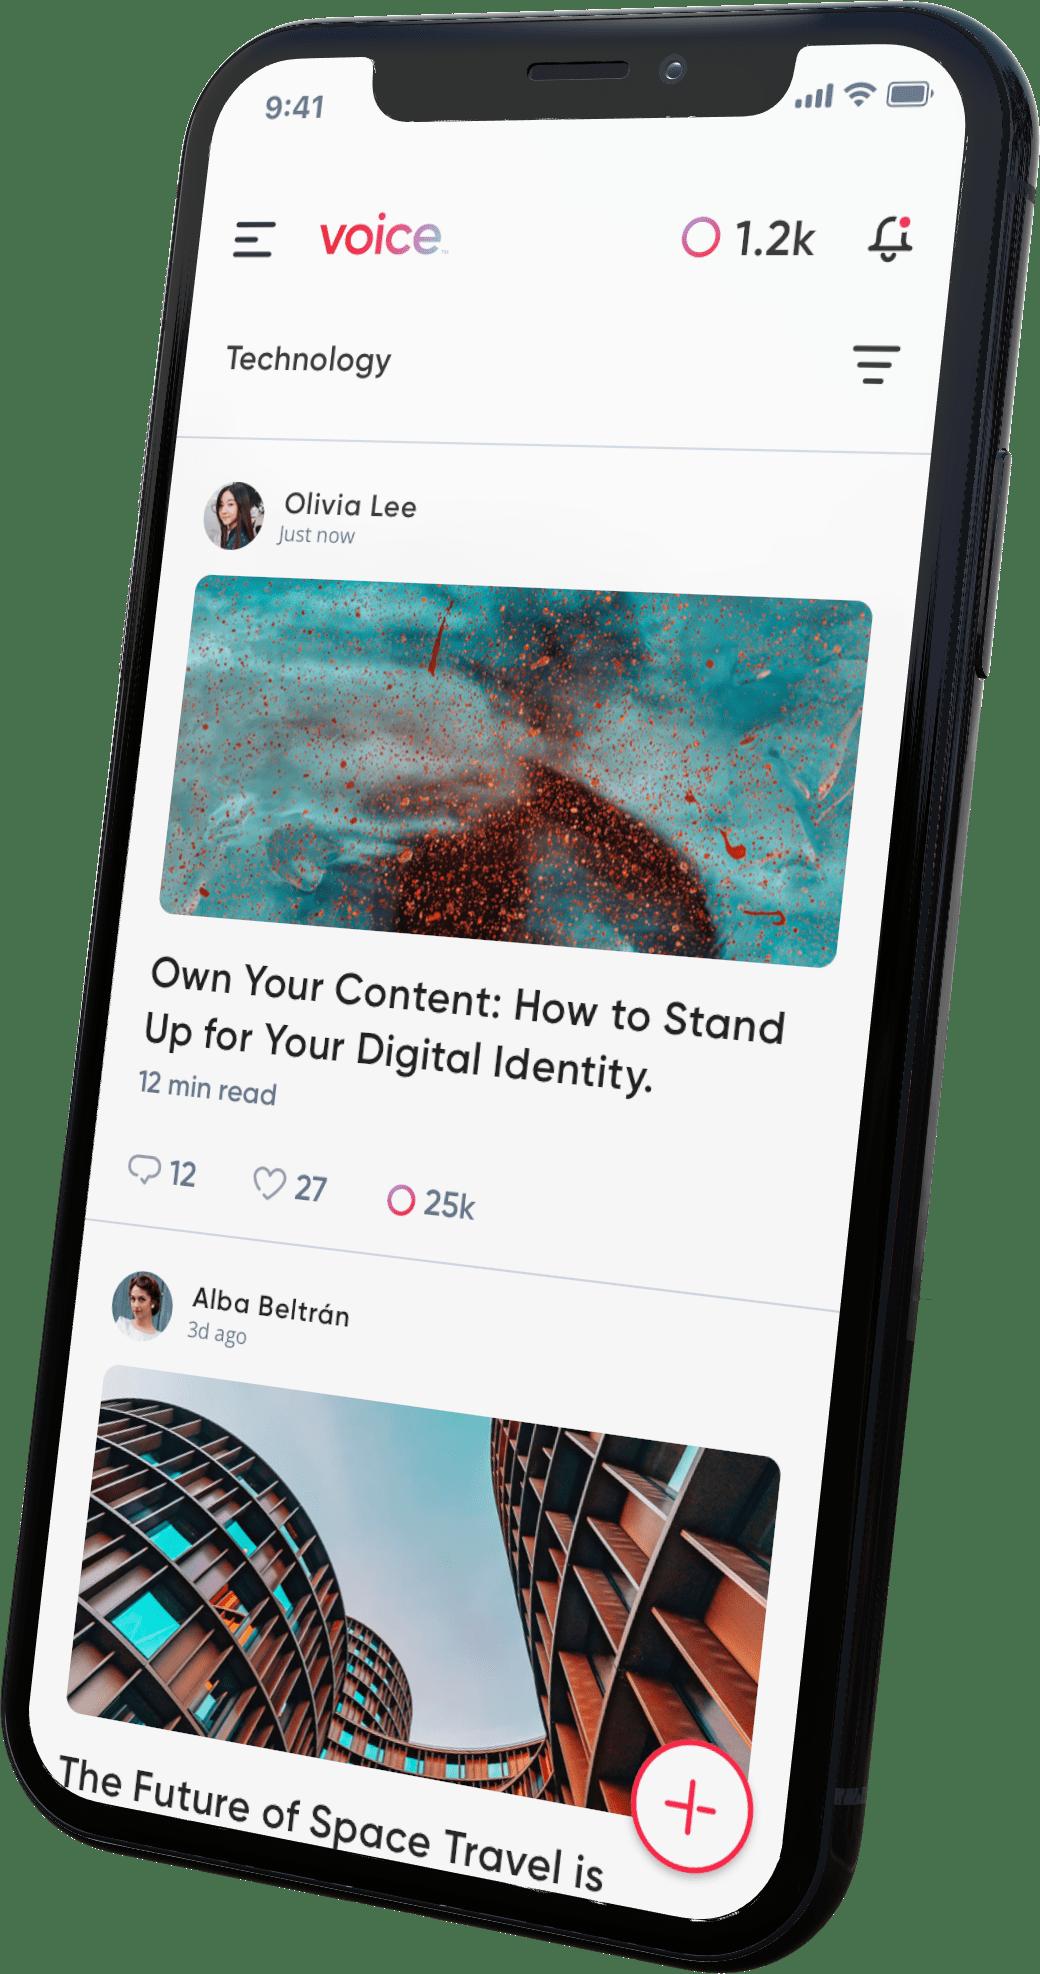 Voice App on Phone